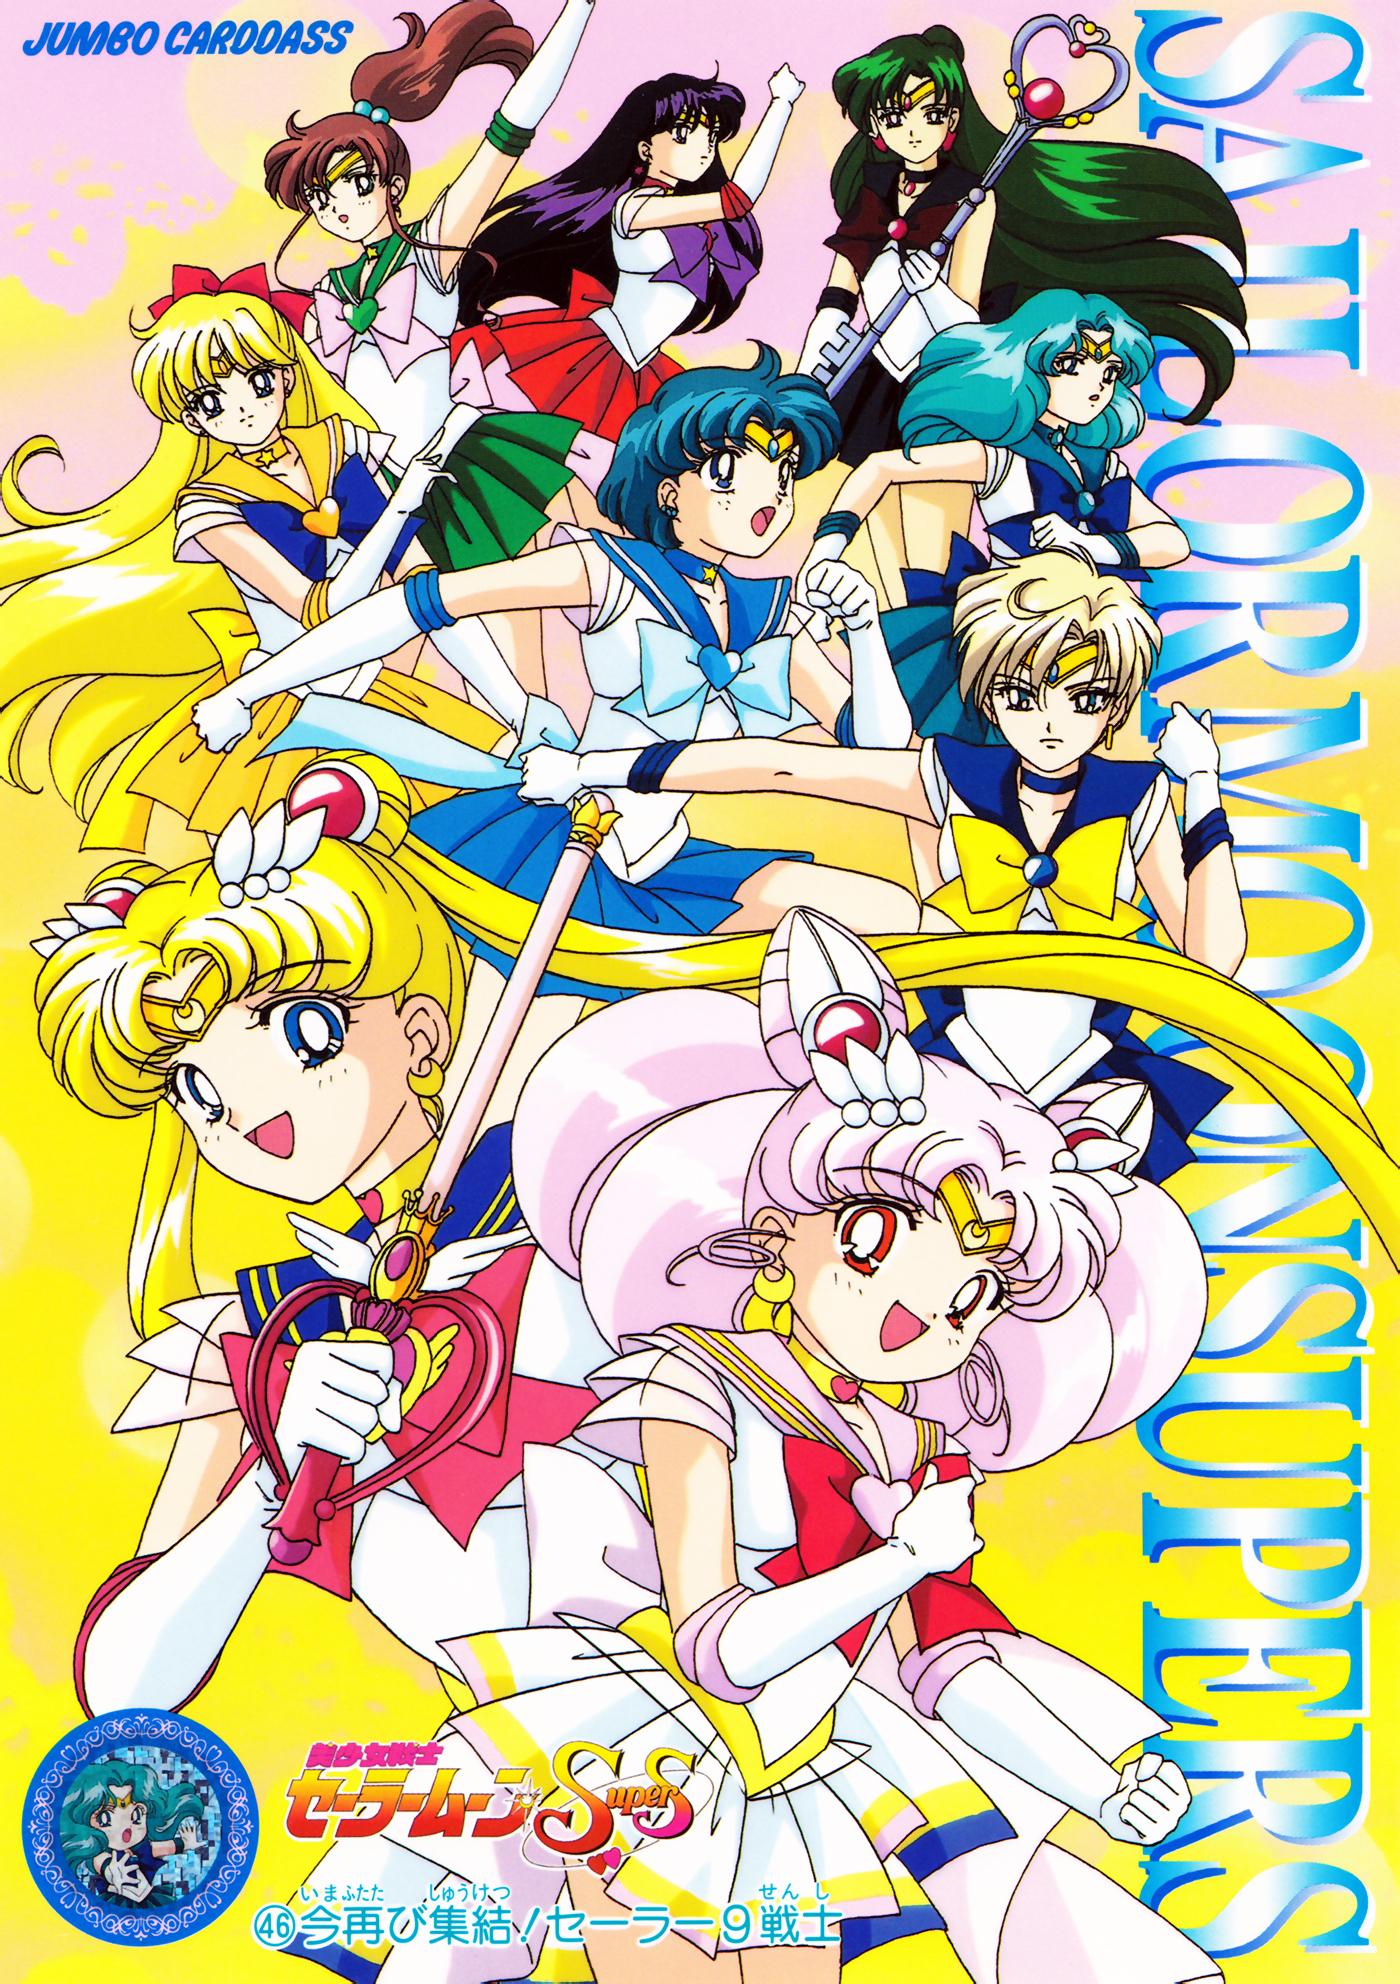 Sailor_moon_ss_jumbo_carddass_4_04